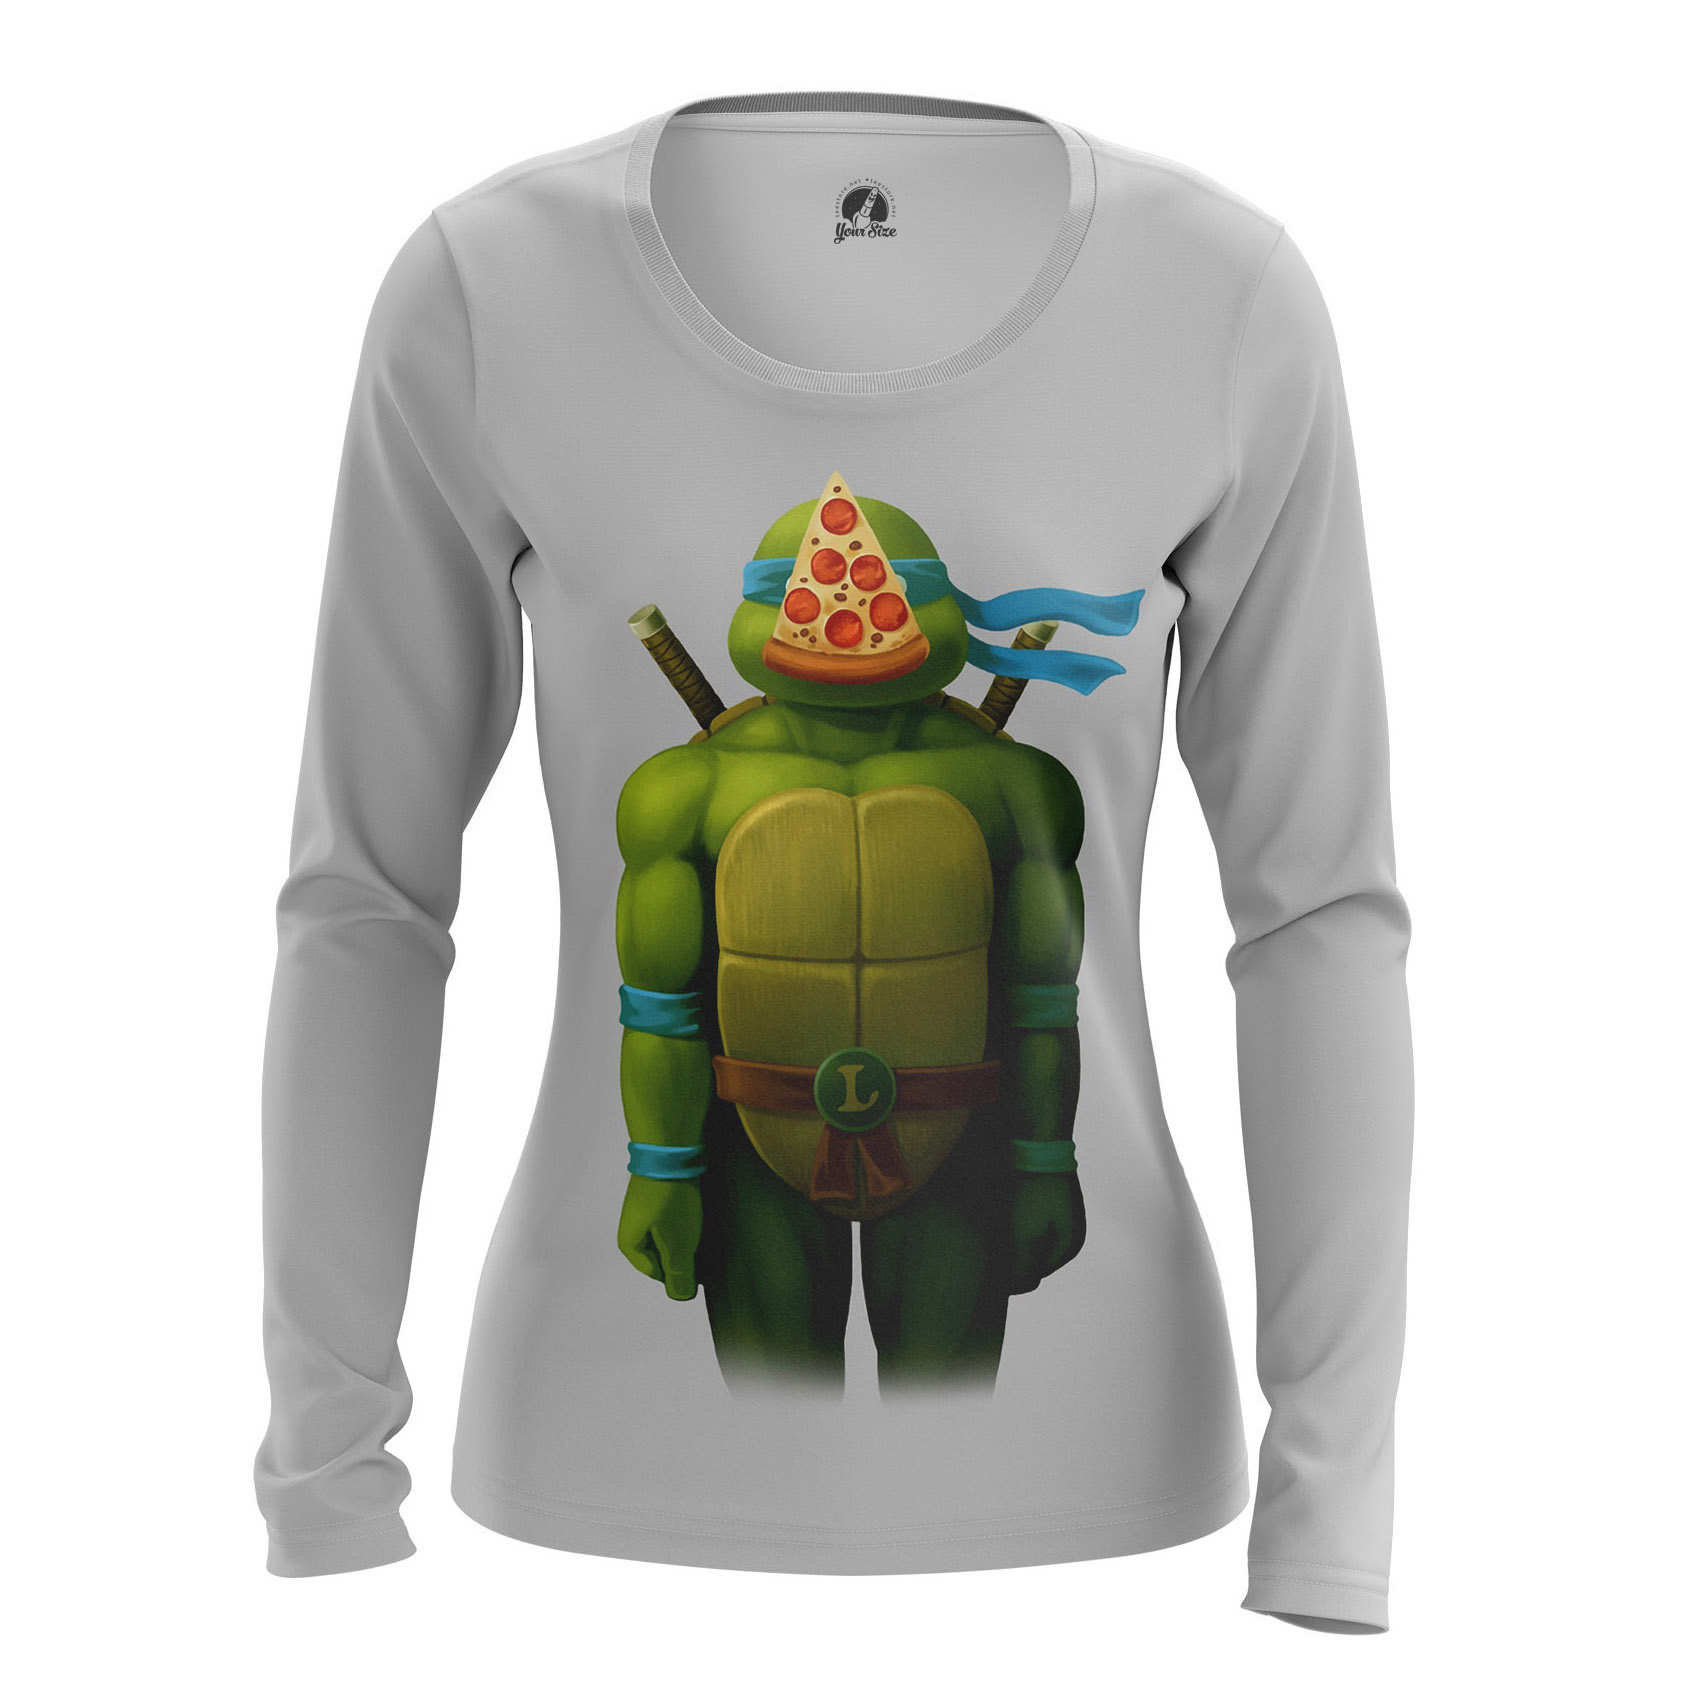 Collectibles Women'S Long Sleeve Leo Tmnt Ninja Turtles Pizza